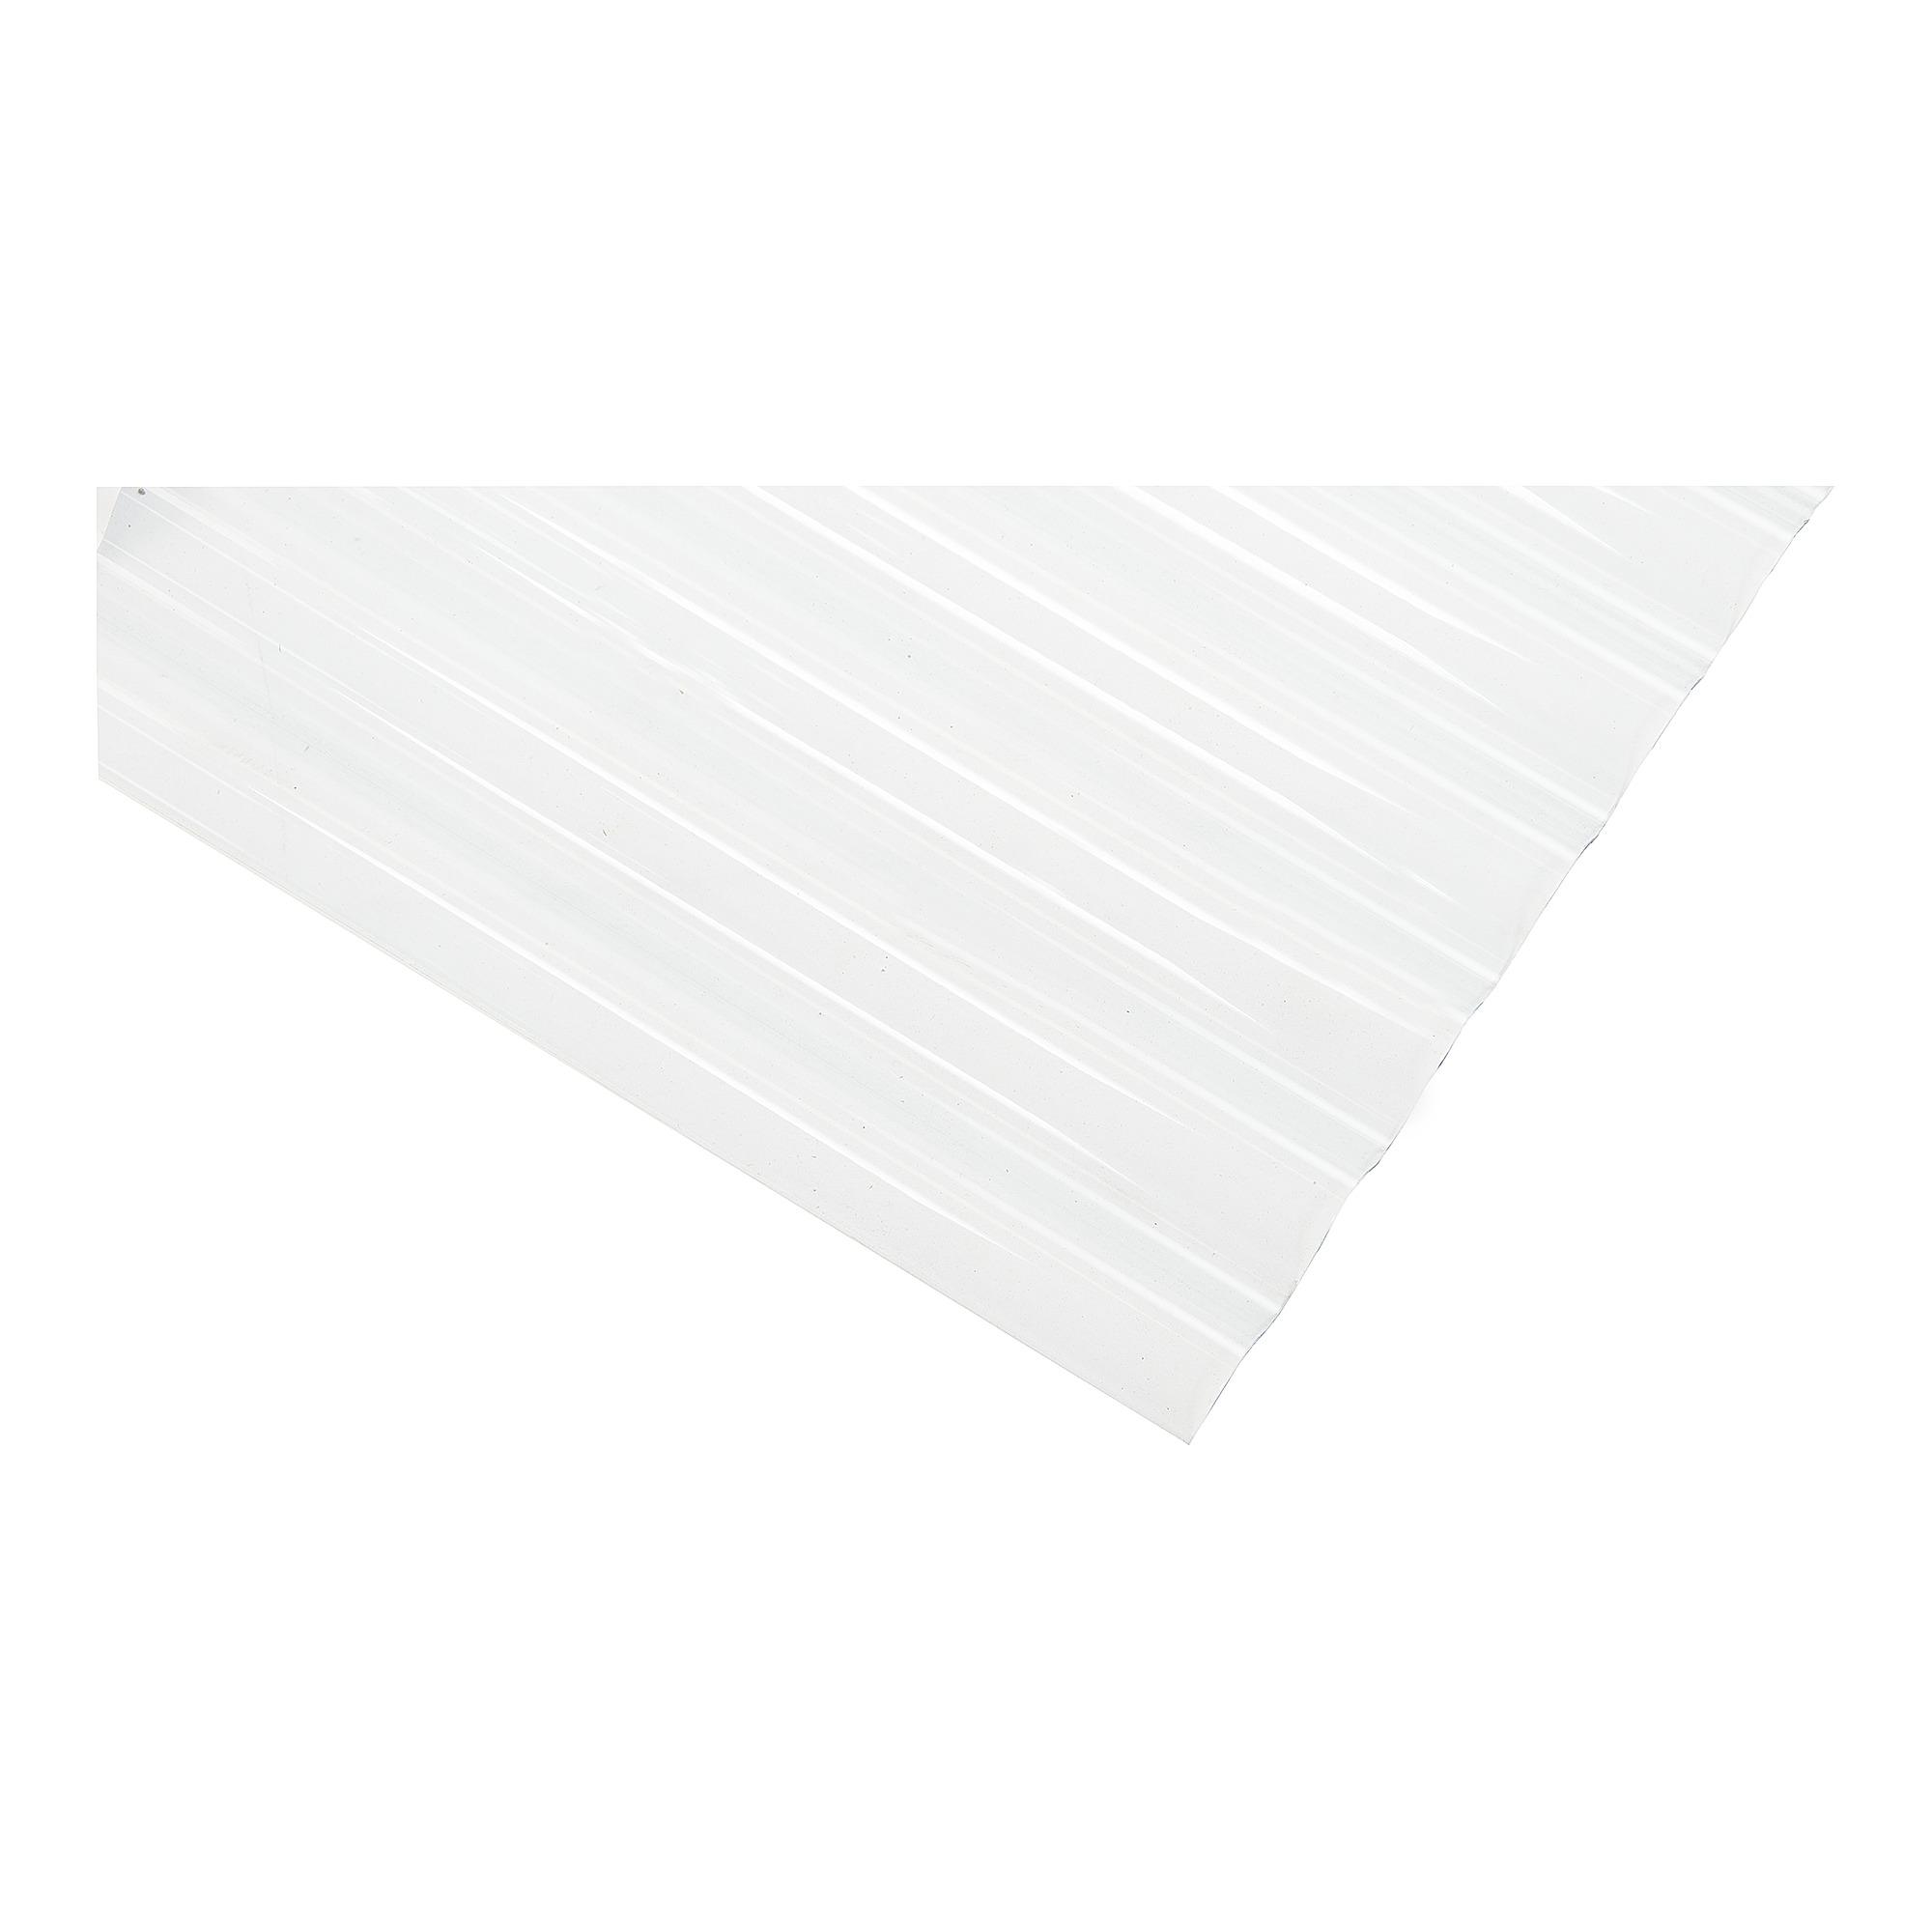 panneau ondul kristal 32 9 98 x 153 cm translucide. Black Bedroom Furniture Sets. Home Design Ideas